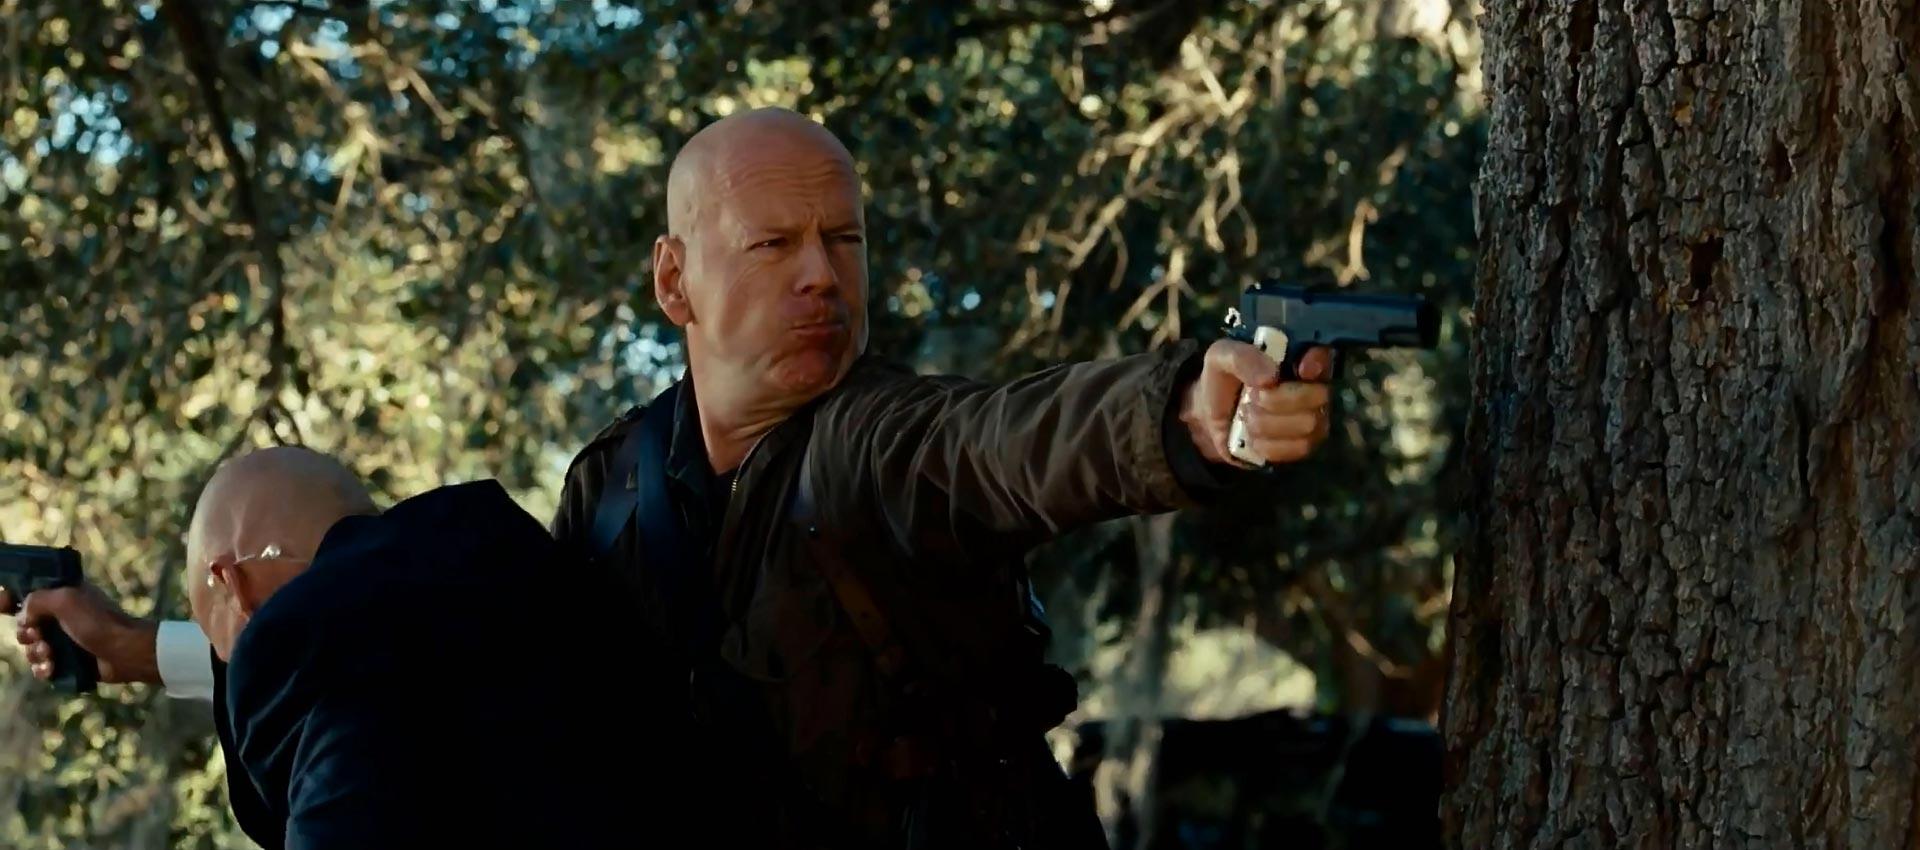 watch new trailer for gi joe retaliation filmofilia